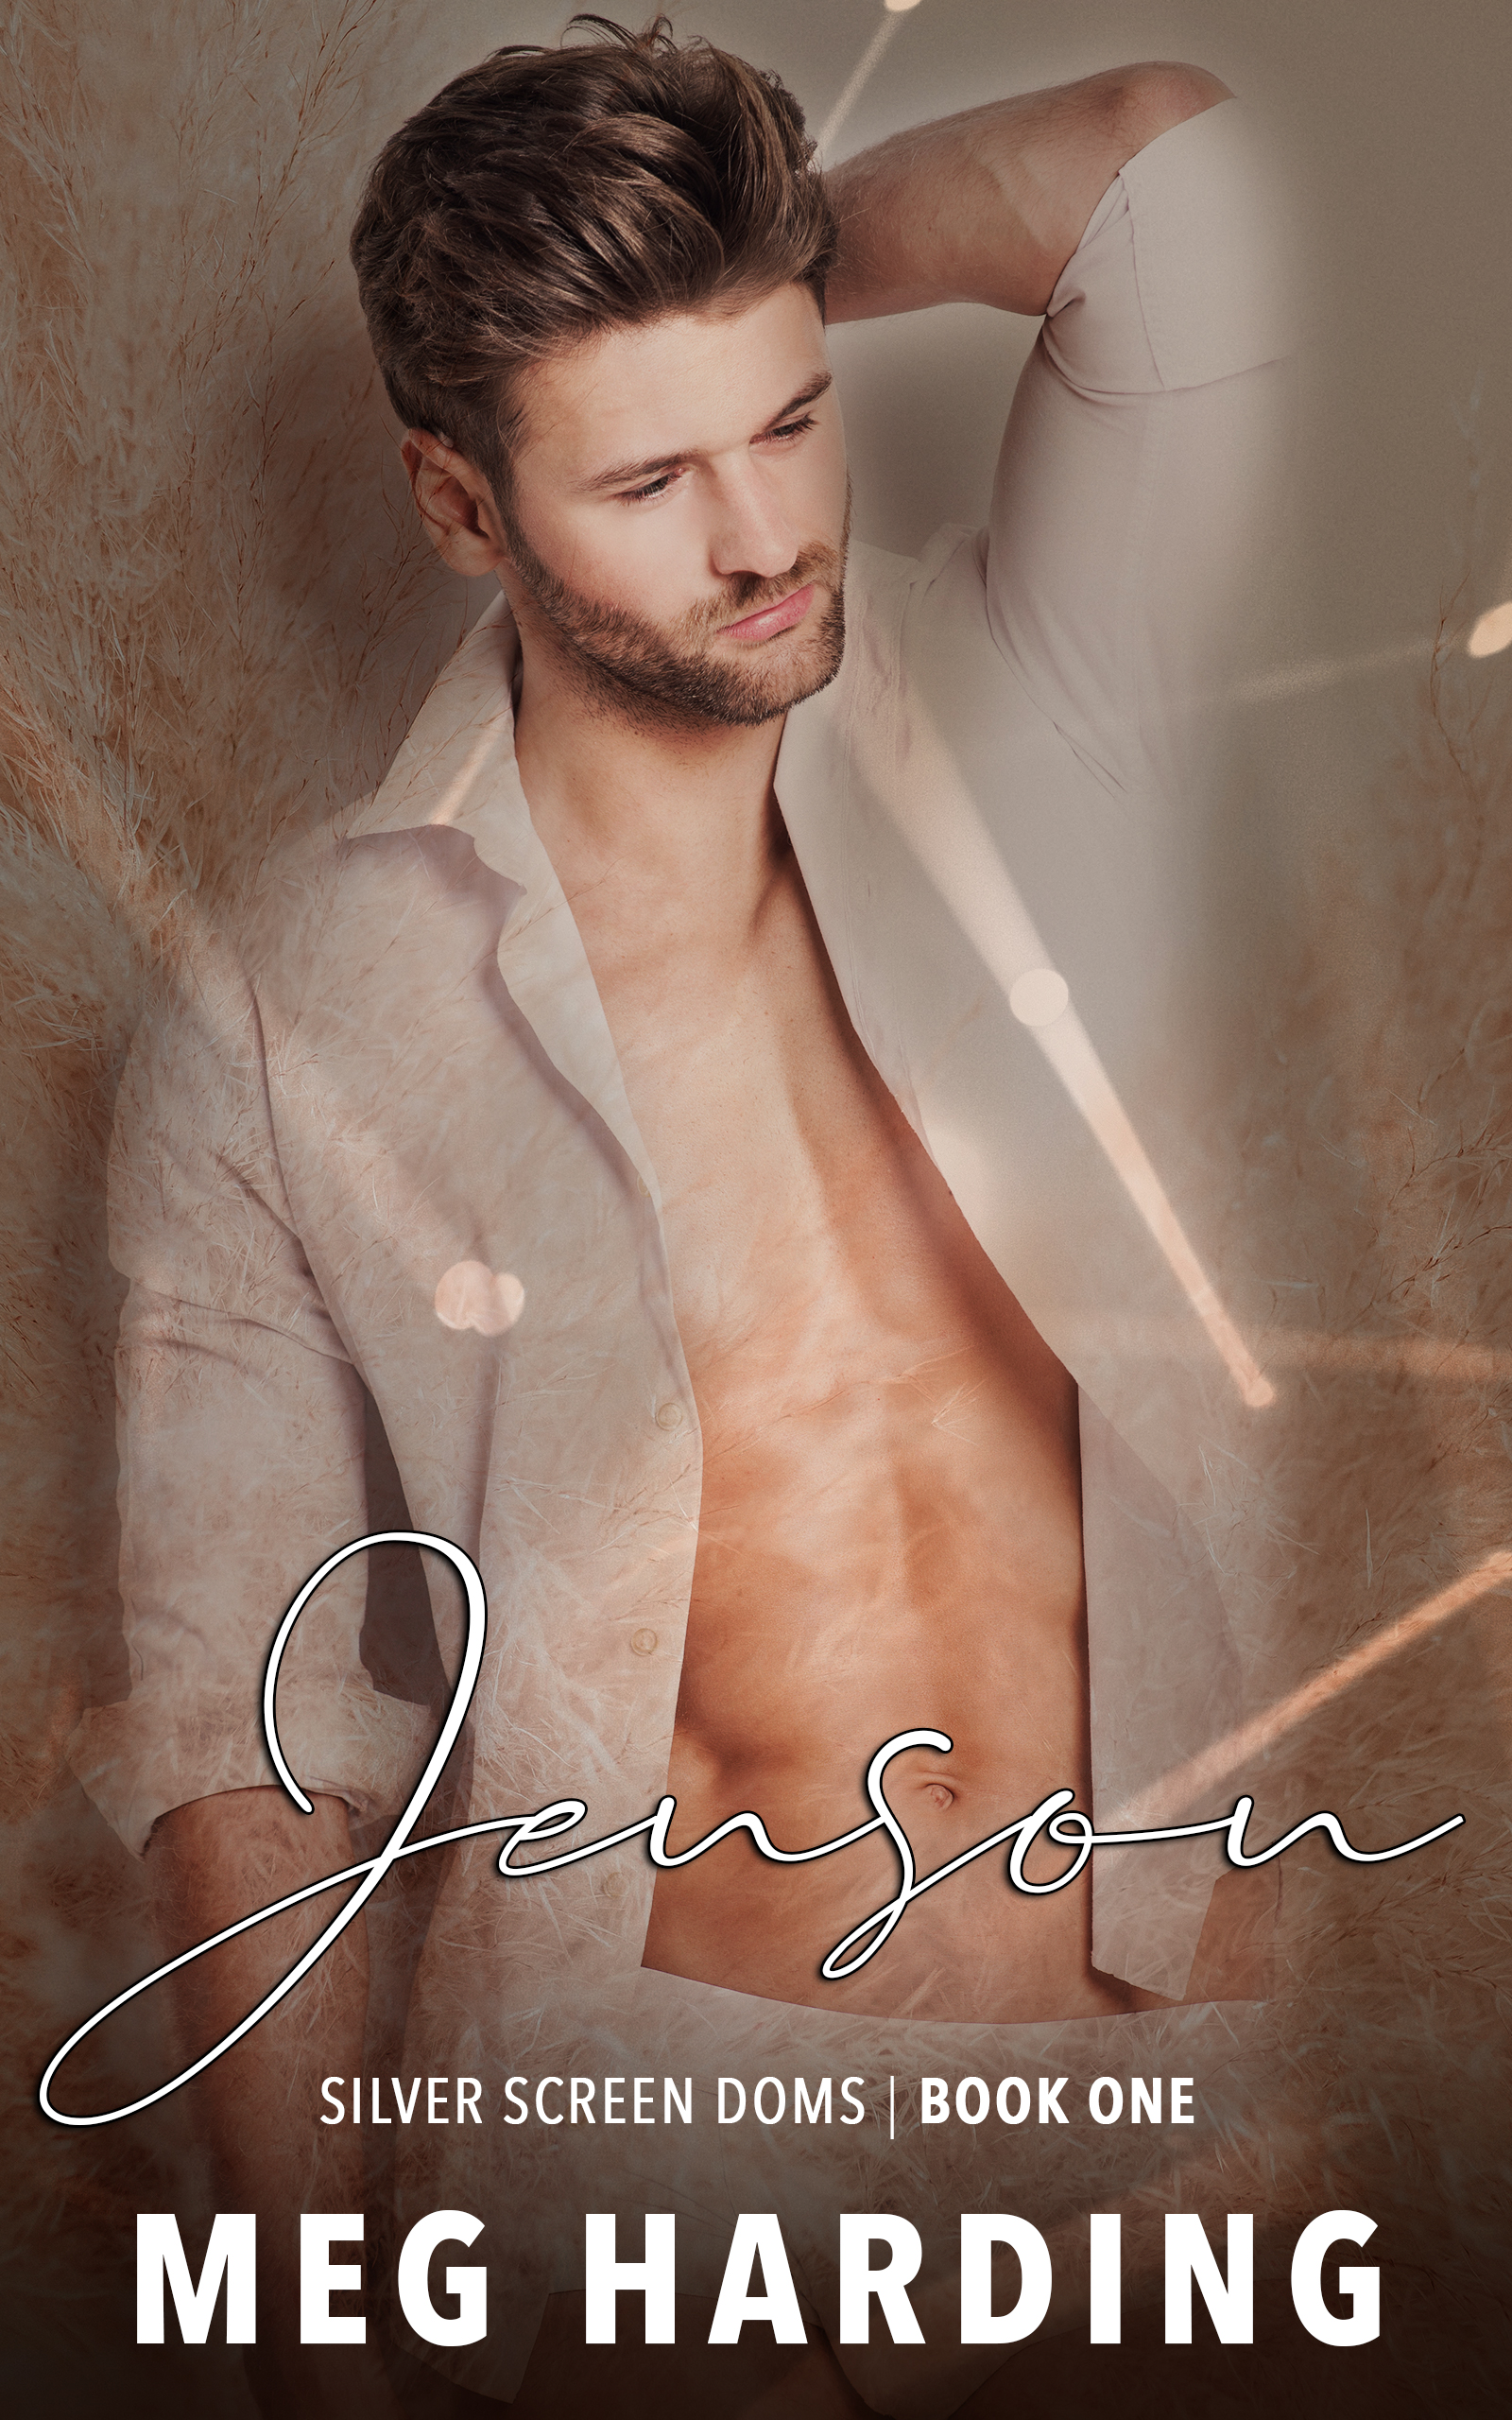 mh-jenson-eBook